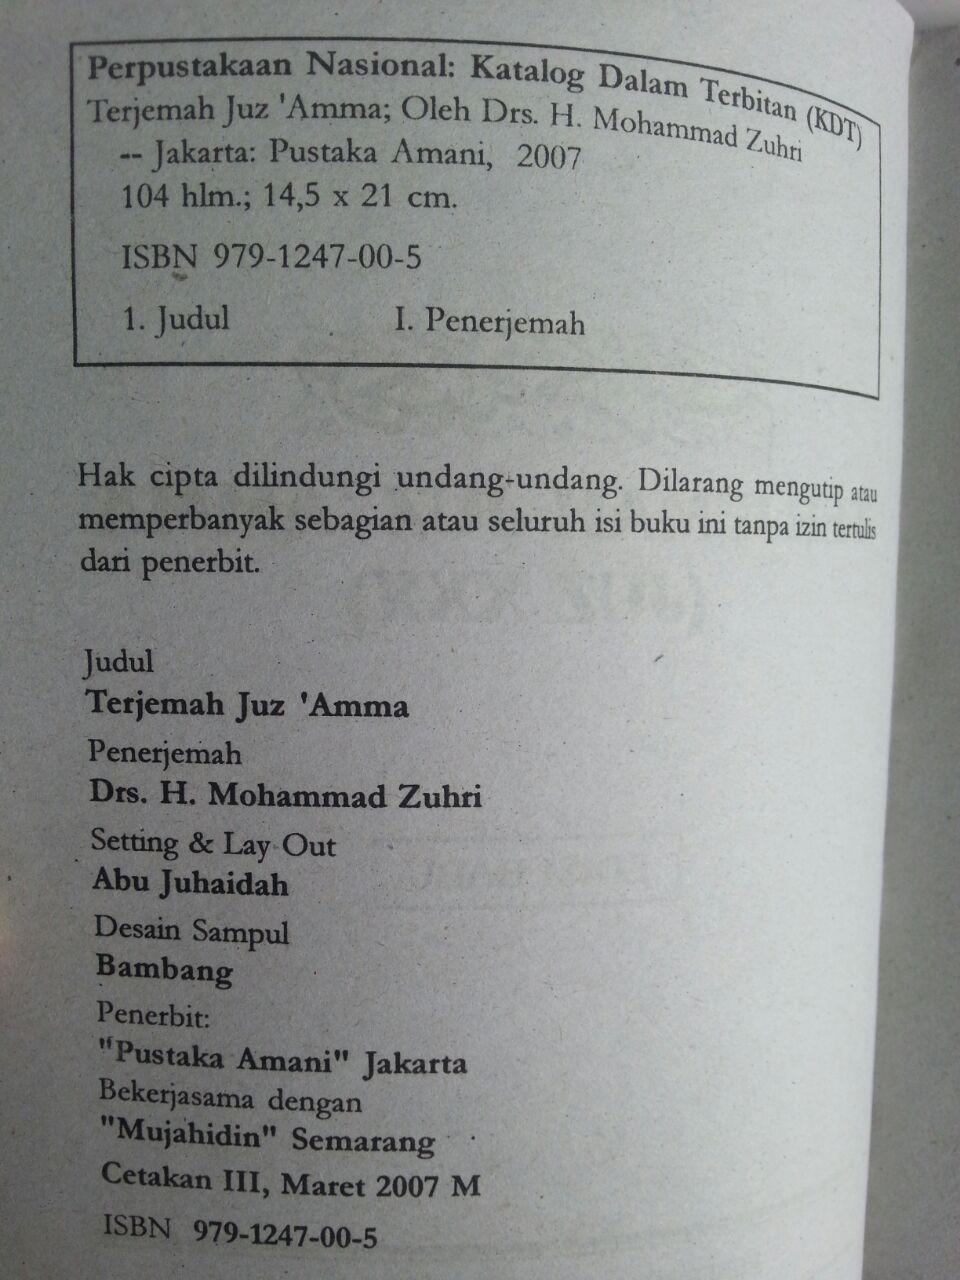 Buku Terjemah Juz Amma Pedoman Baca Quran Transliterasi isi